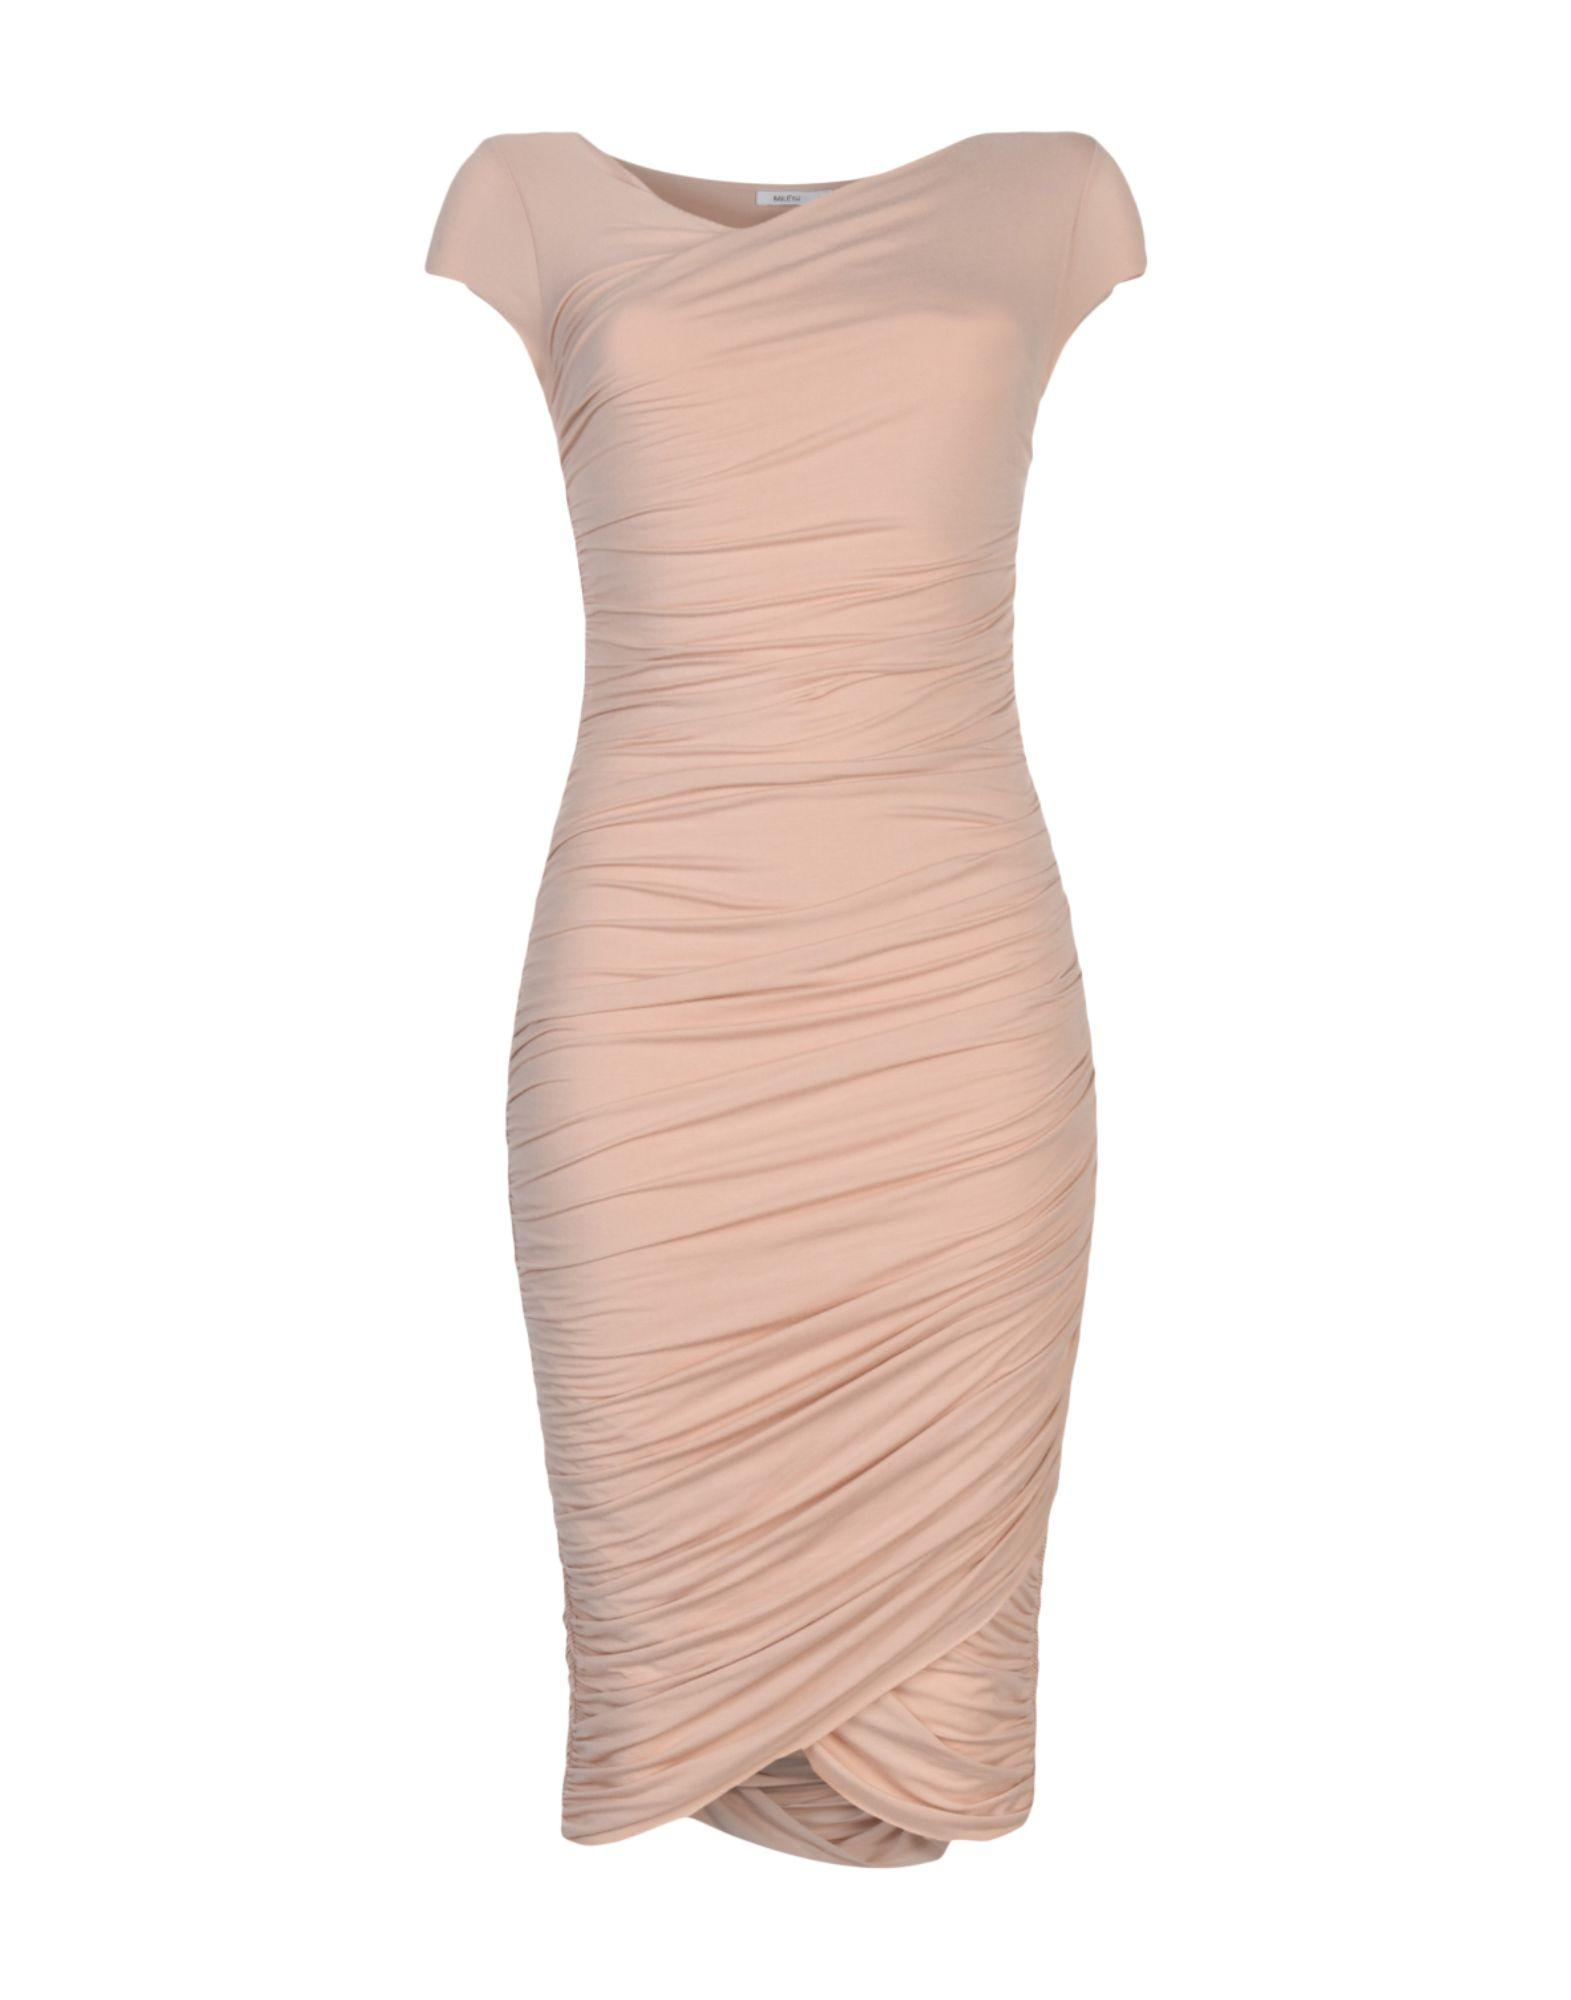 Bailey44 Short Dress In Light Pink